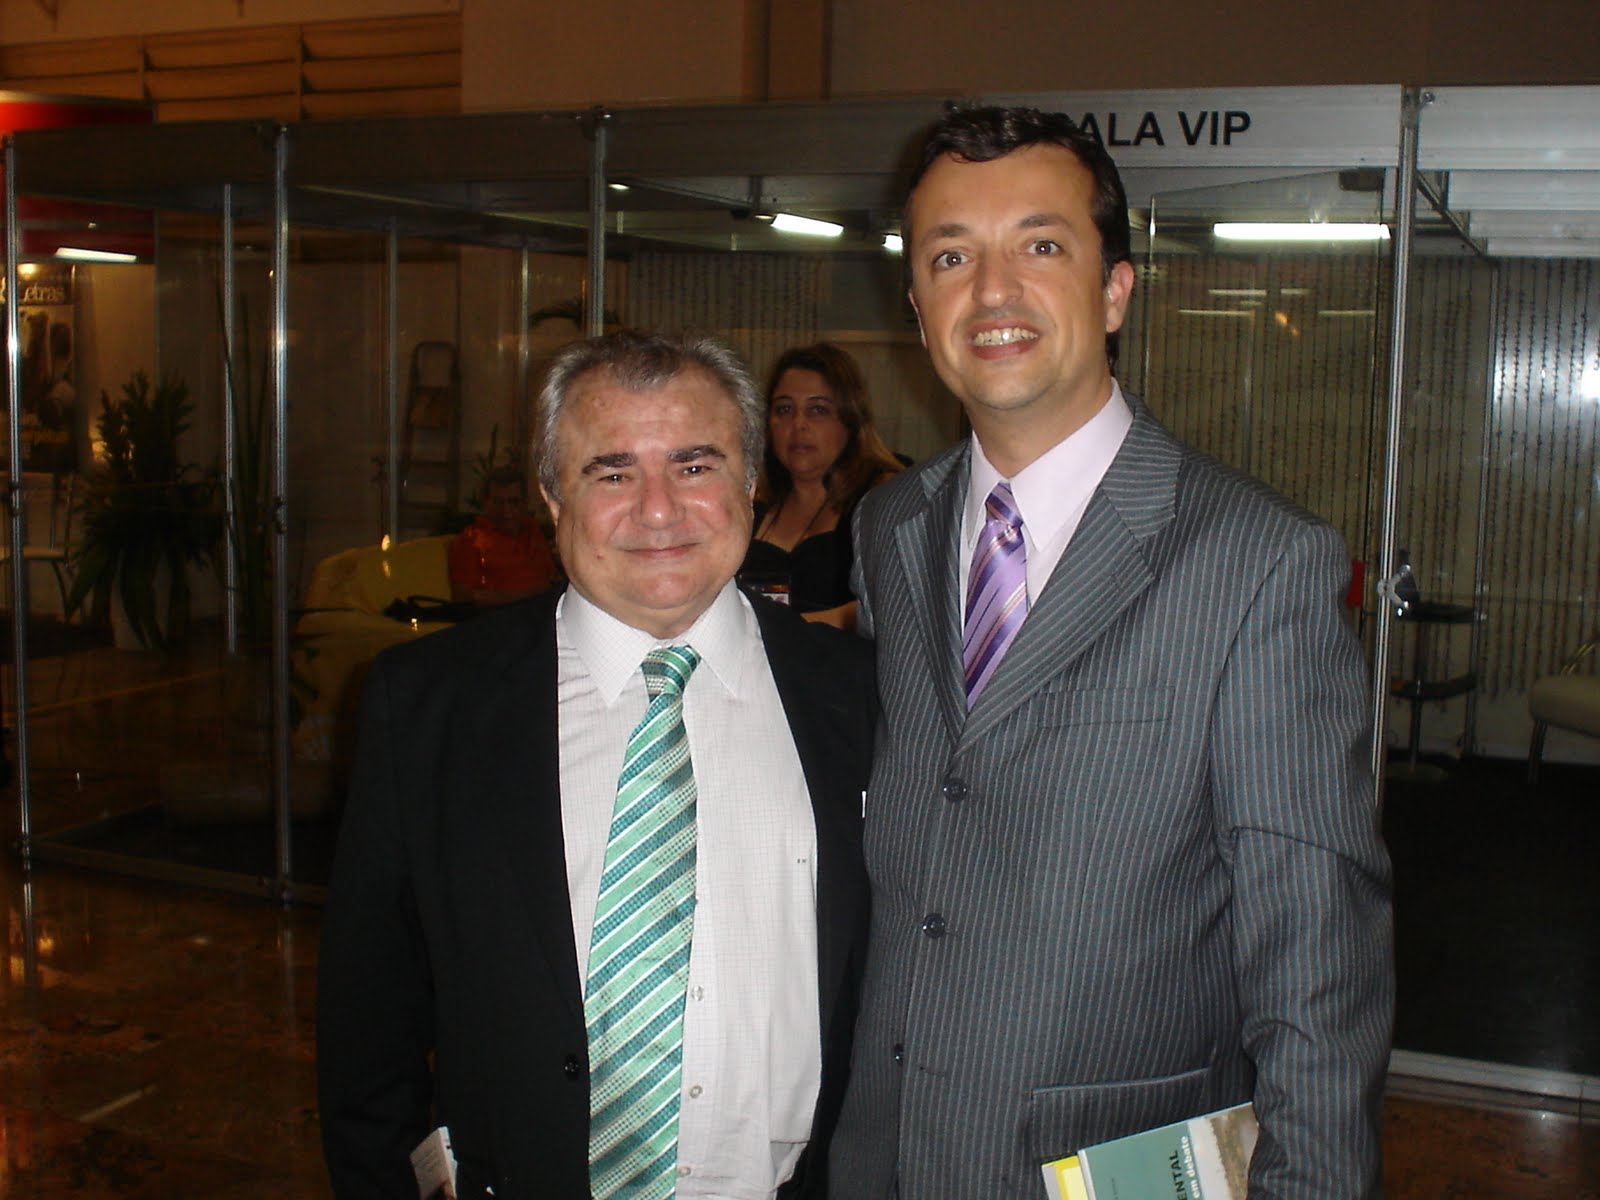 Marcos catalan iii congresso internacional de direito de fam lia - Marcos catalan ...